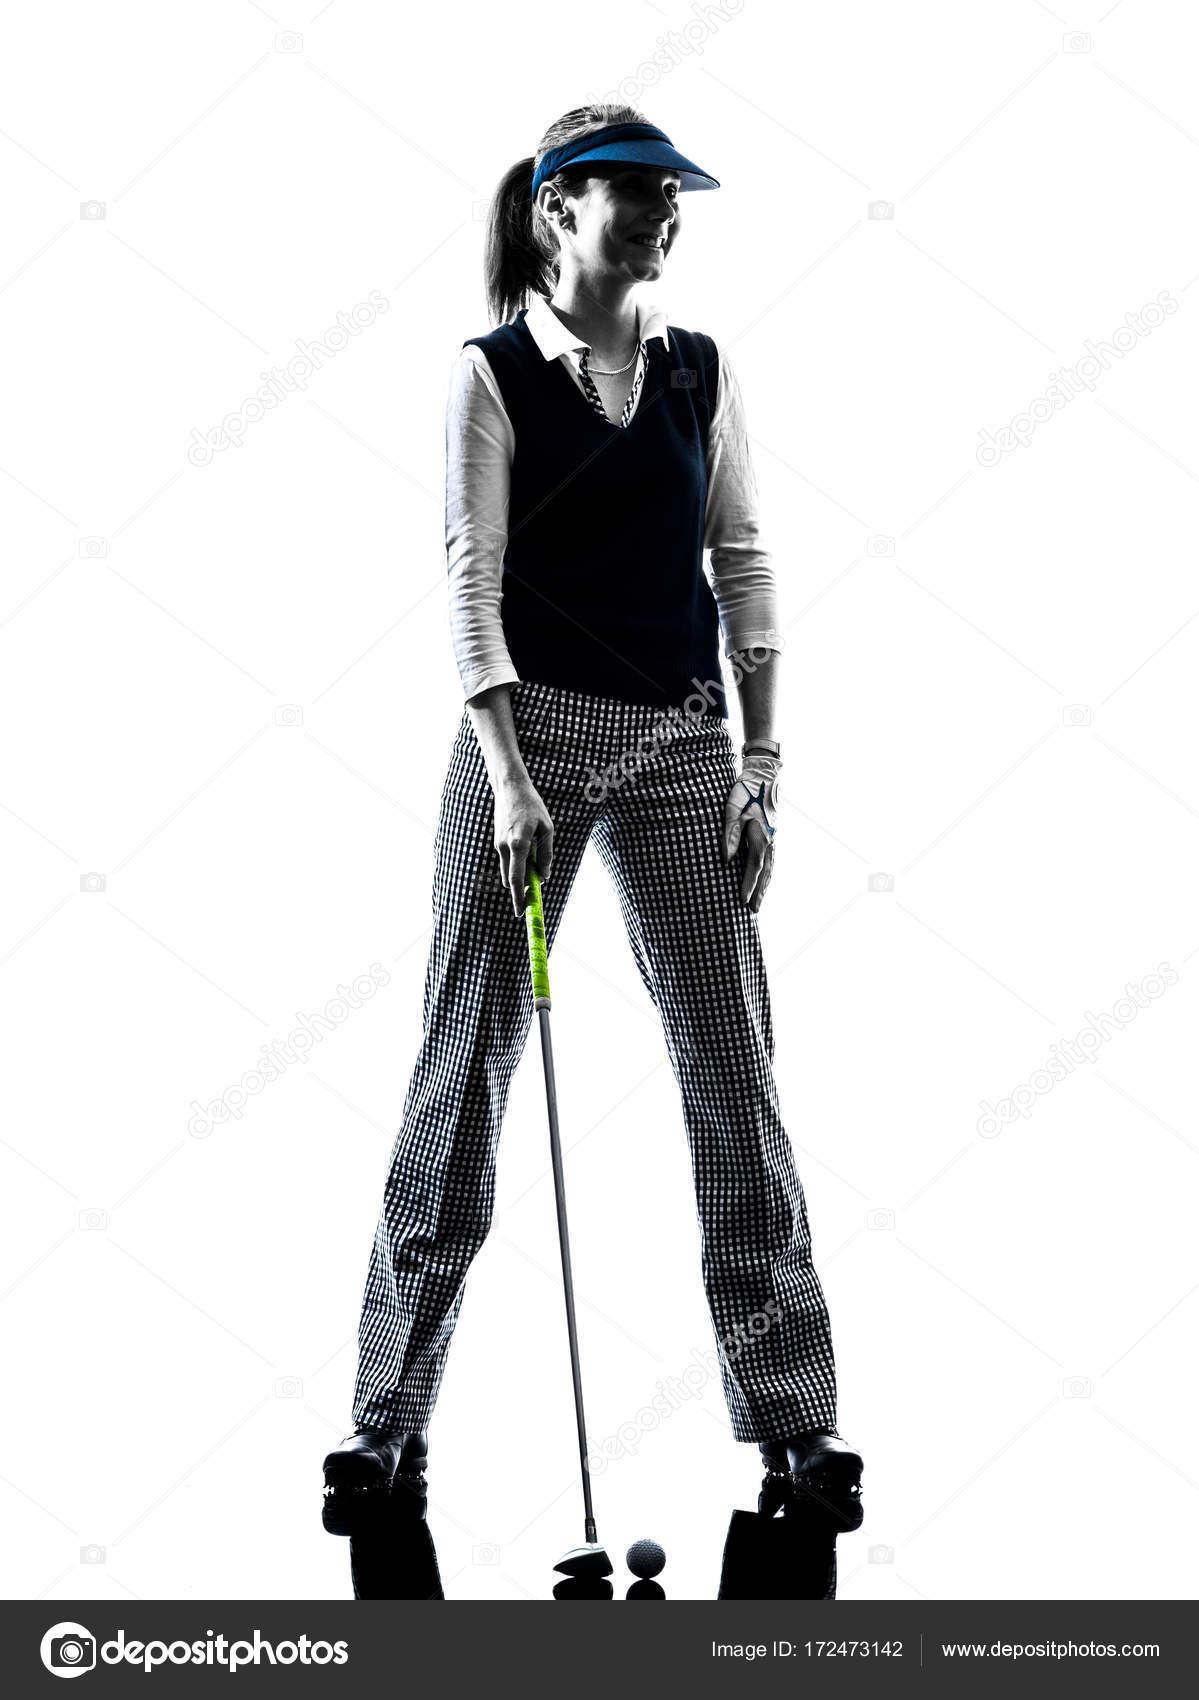 Golf Silhouette Frau Golfspieler Stockfoto C Stylepics 172473142